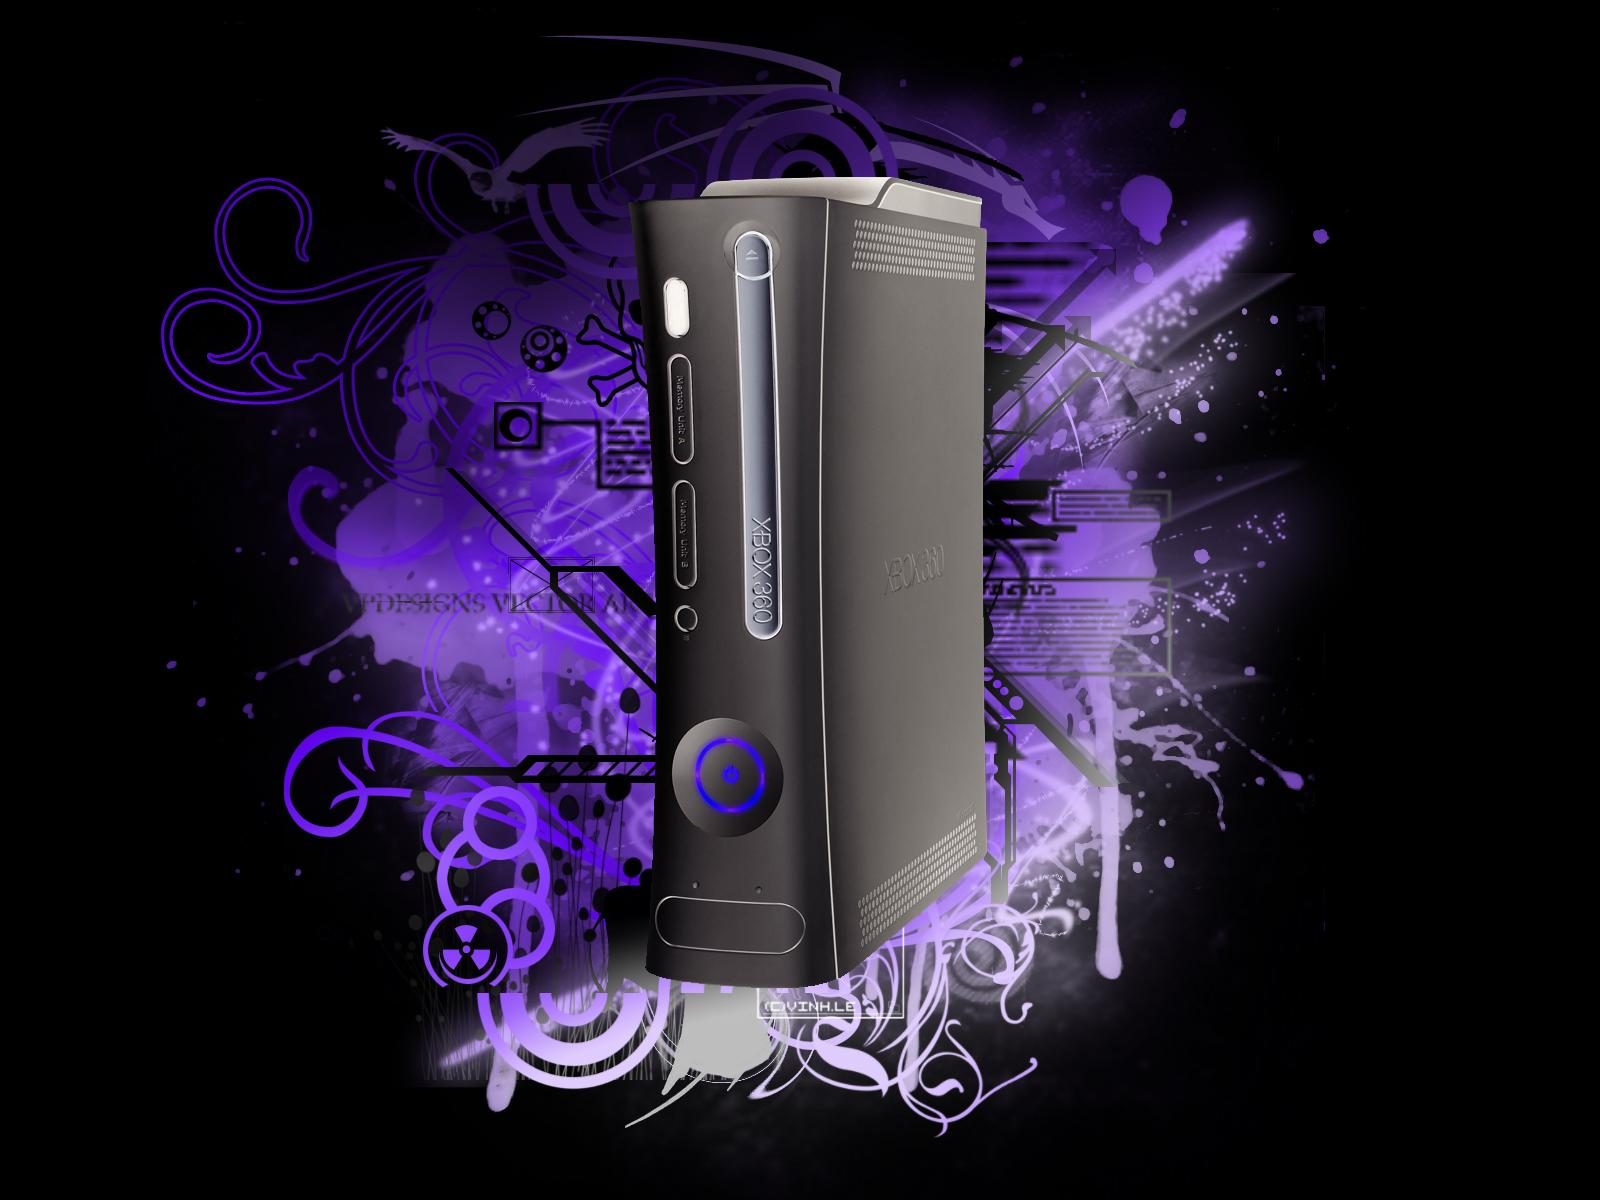 Images Xbox 360 Elite Wallpapers 1600x1200